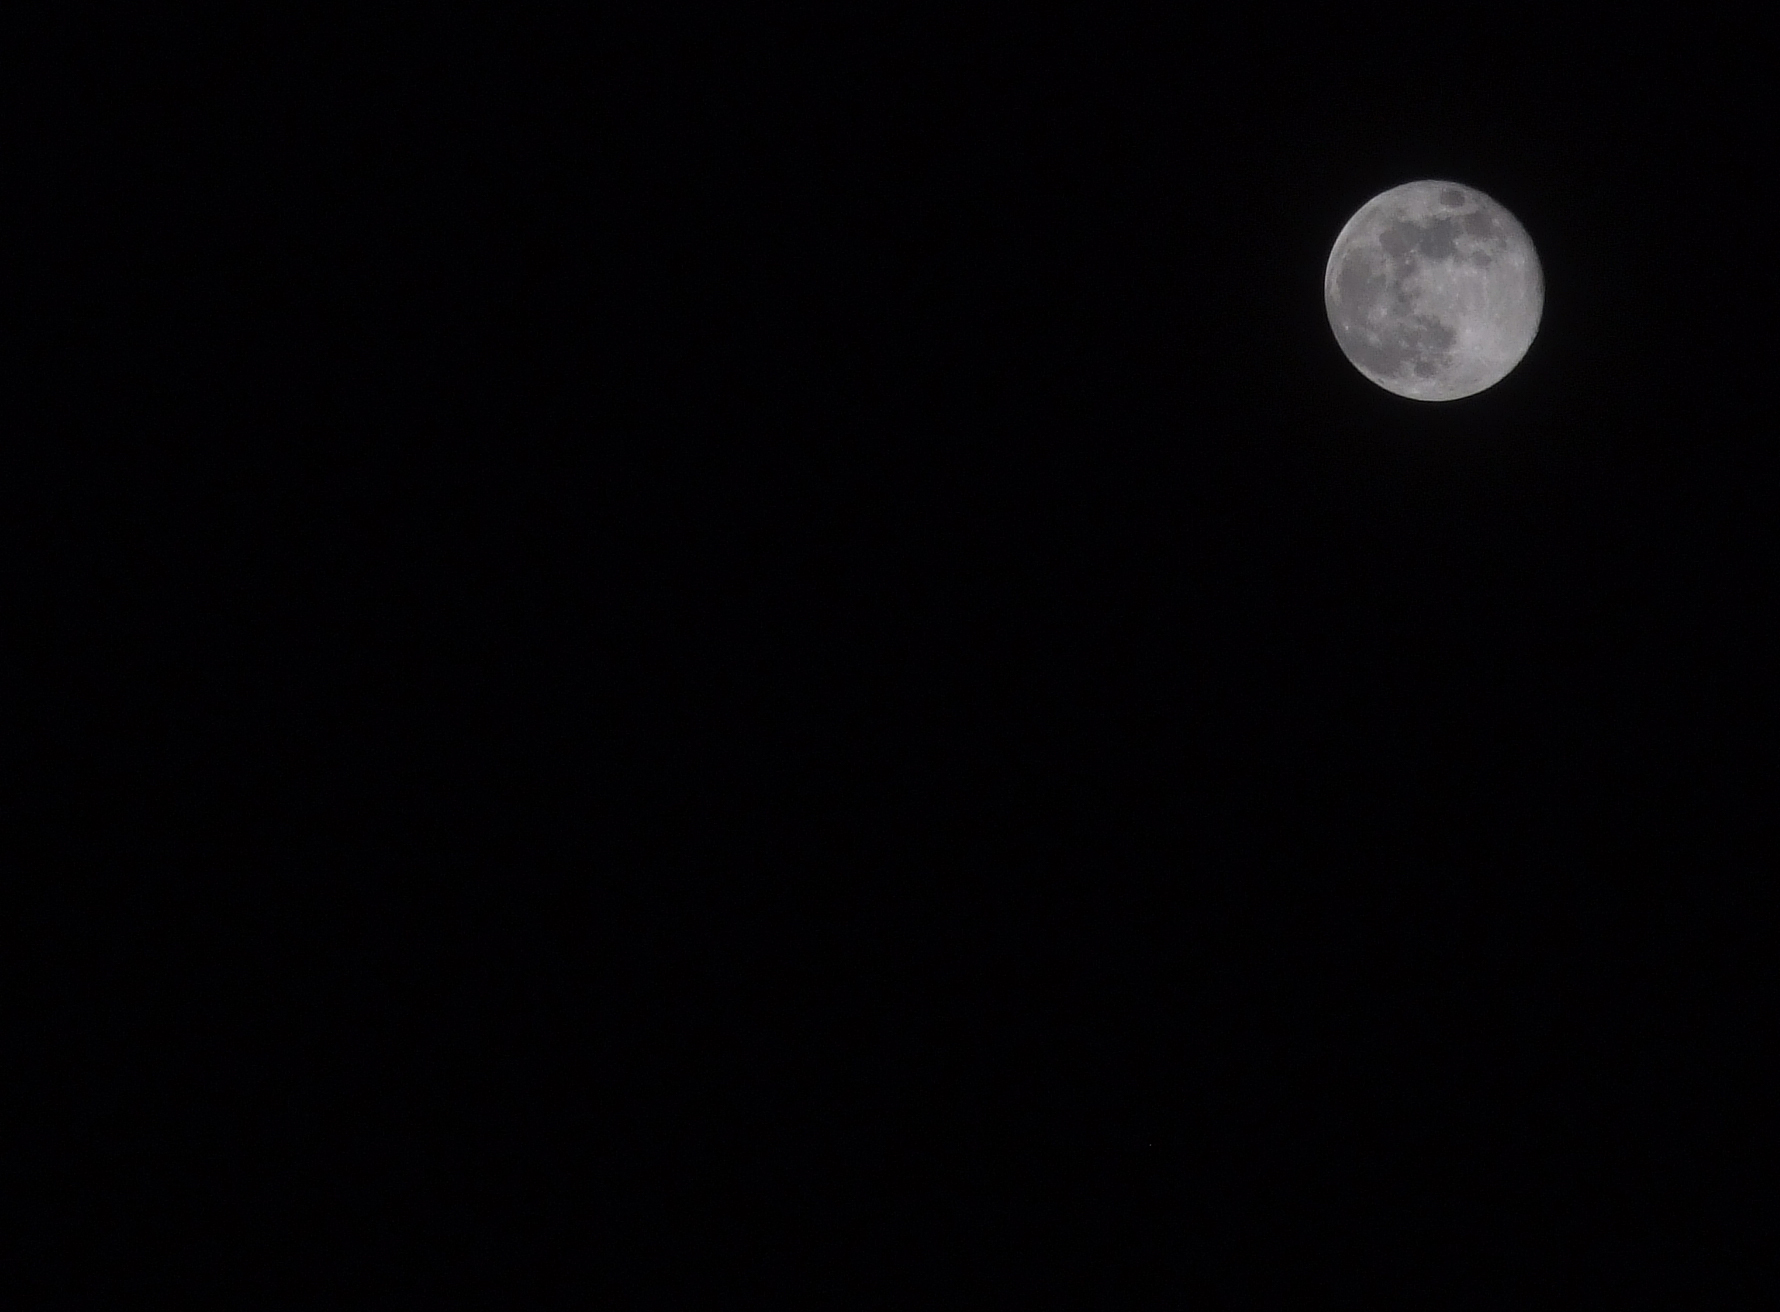 Moon, Black, Bspo06, Lunar, Night, HQ Photo